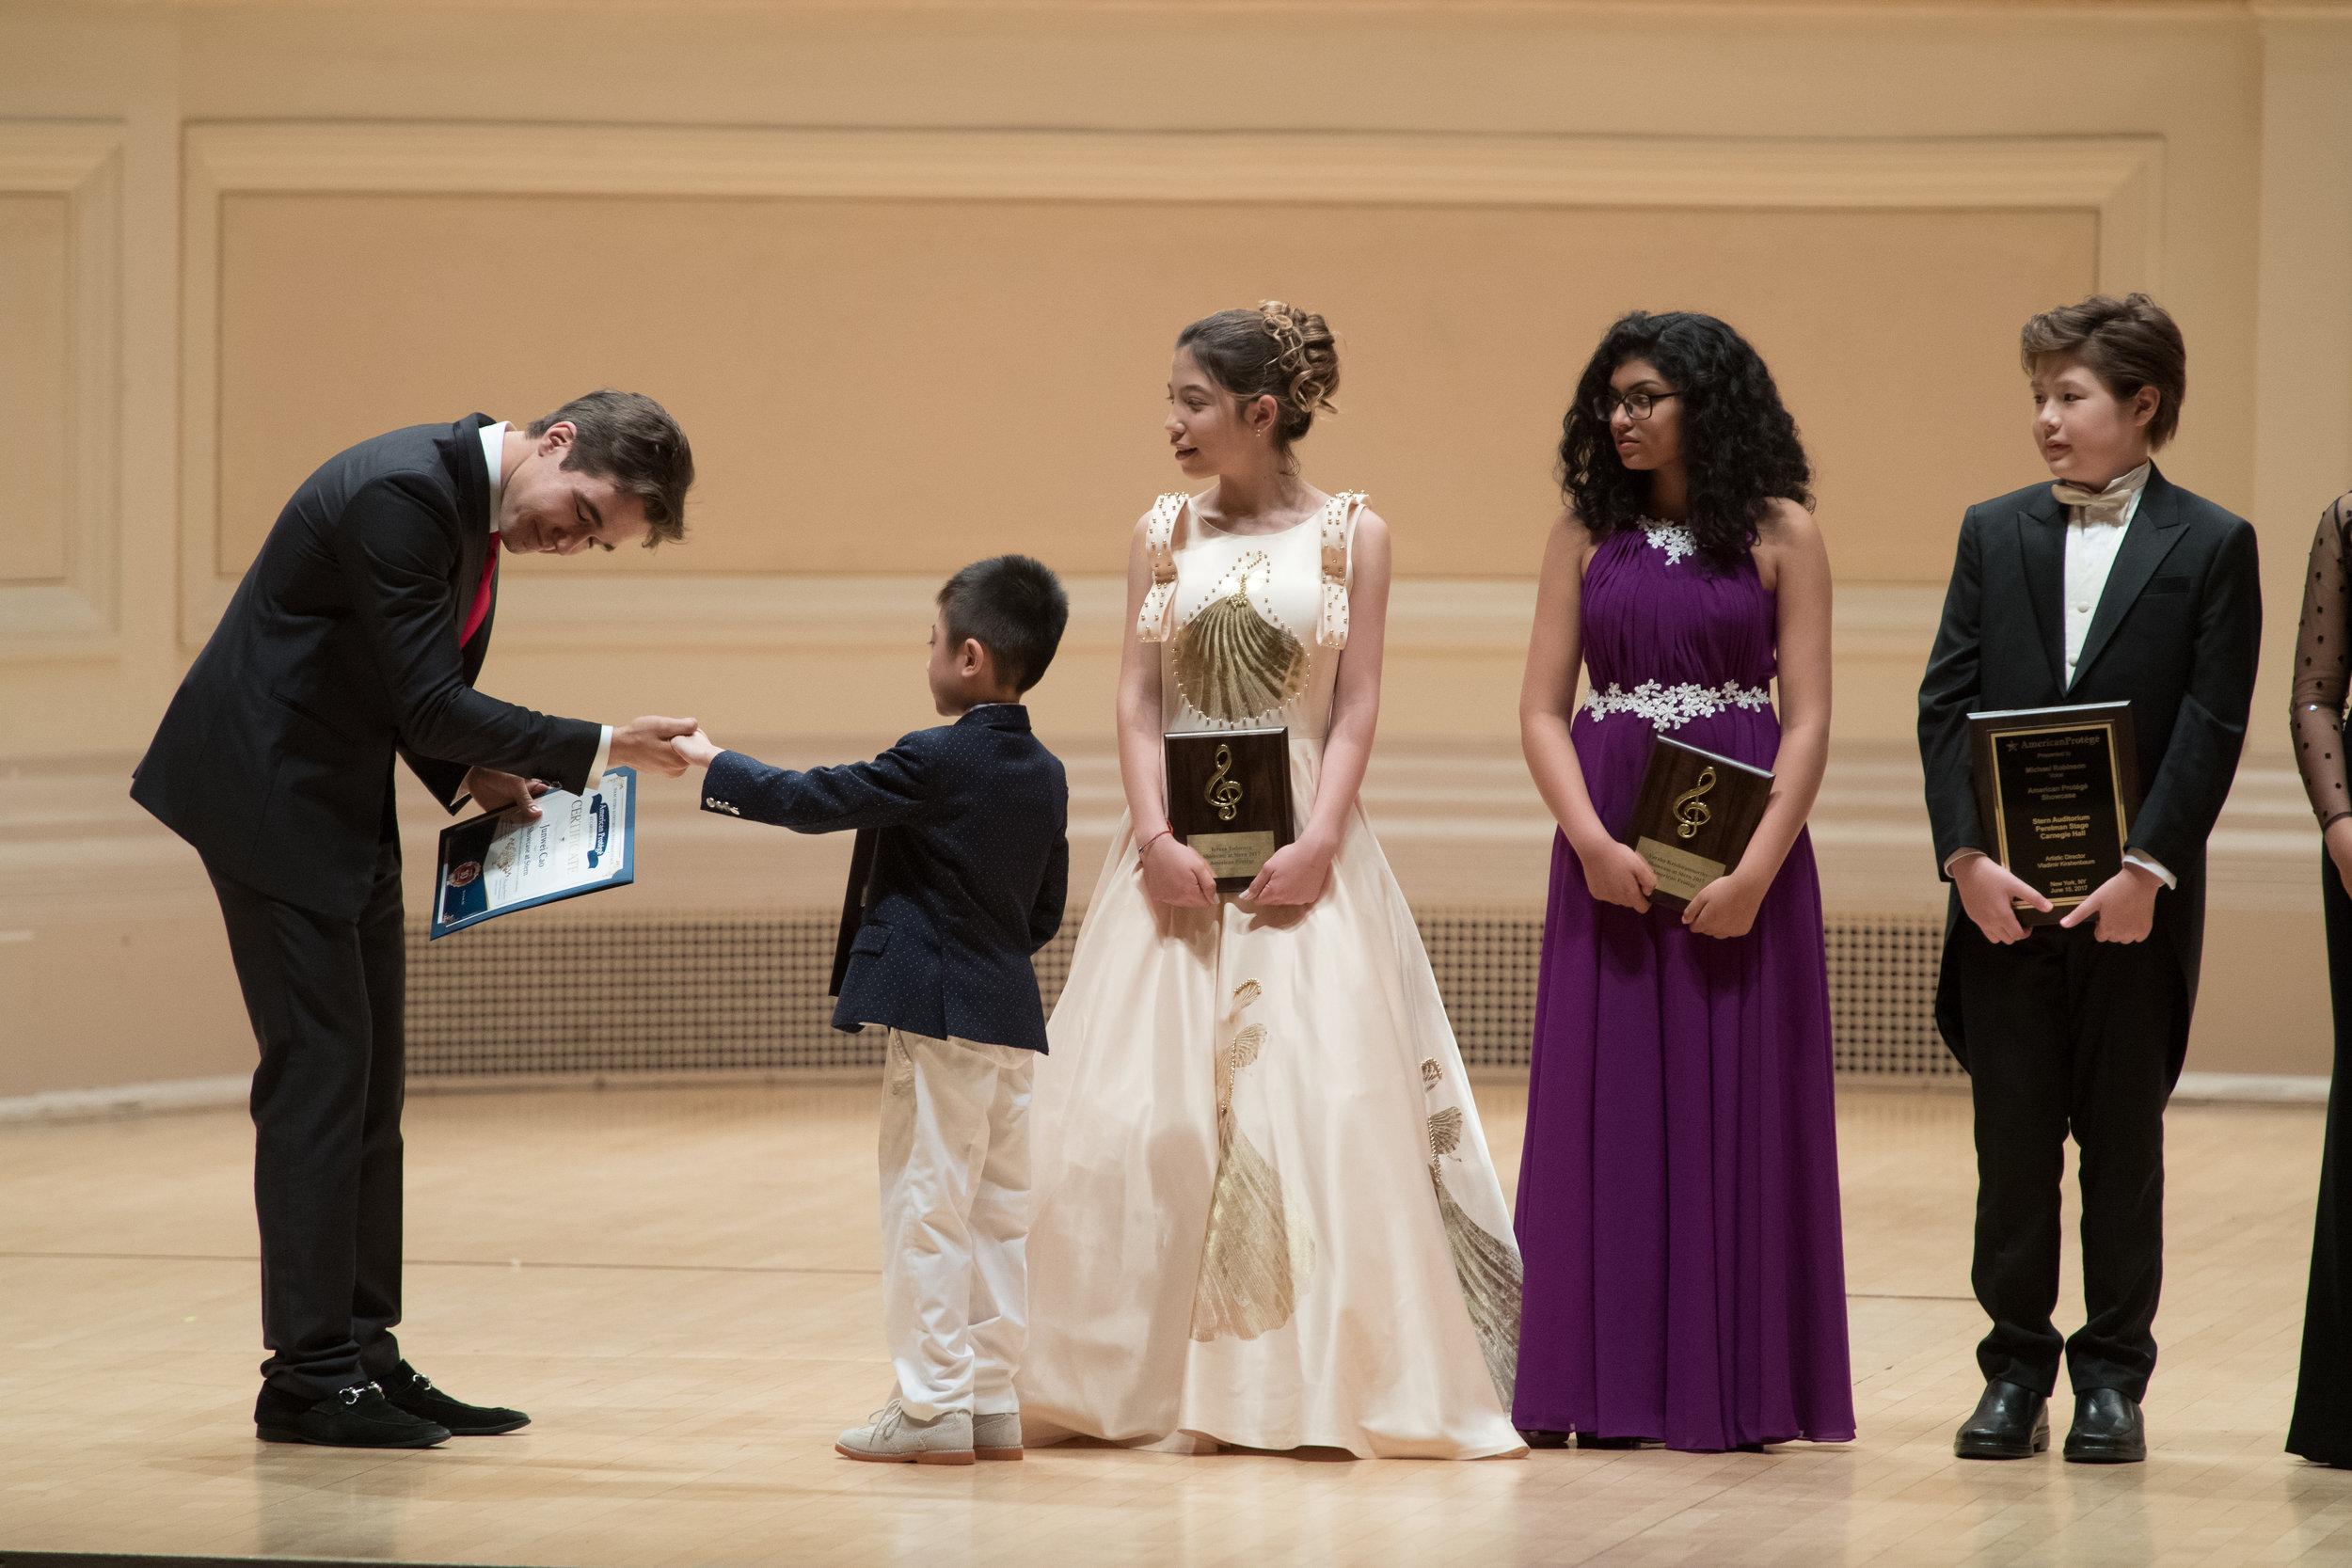 Junwei receiving his award